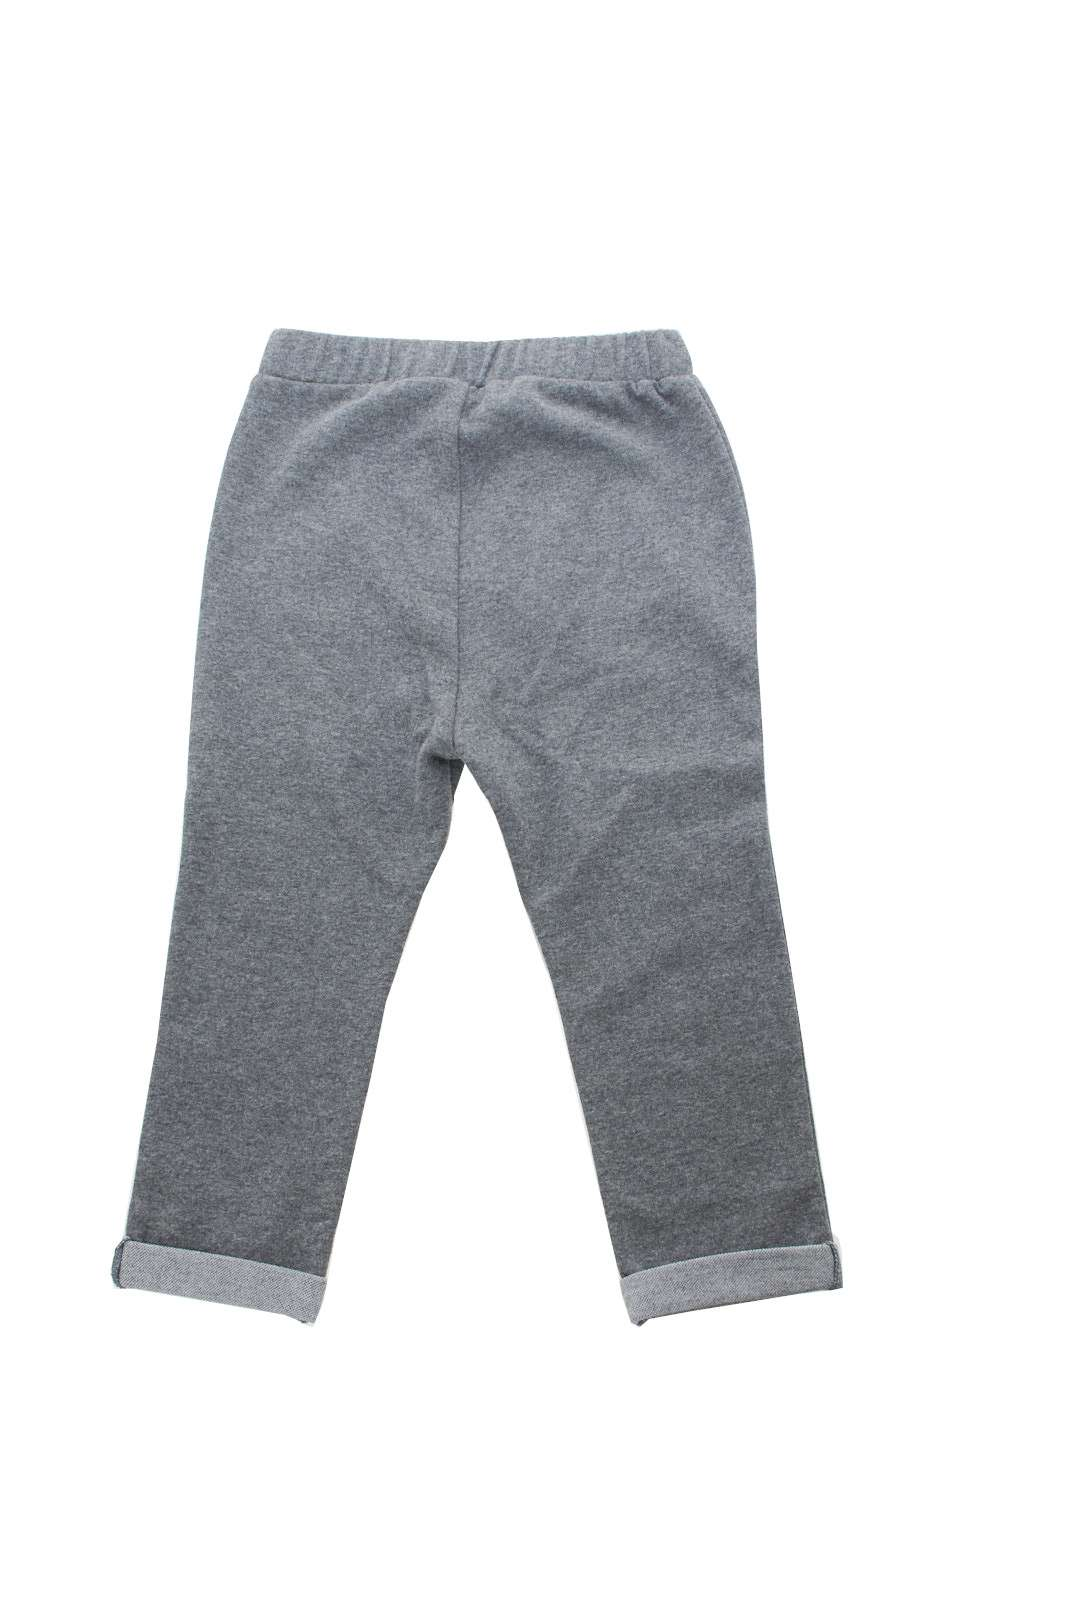 https://www.parmax.com/media/catalog/product/a/i/PE-outlet_parmax-pantaloni-bambina-Liu-Jo-K68059-B.jpg